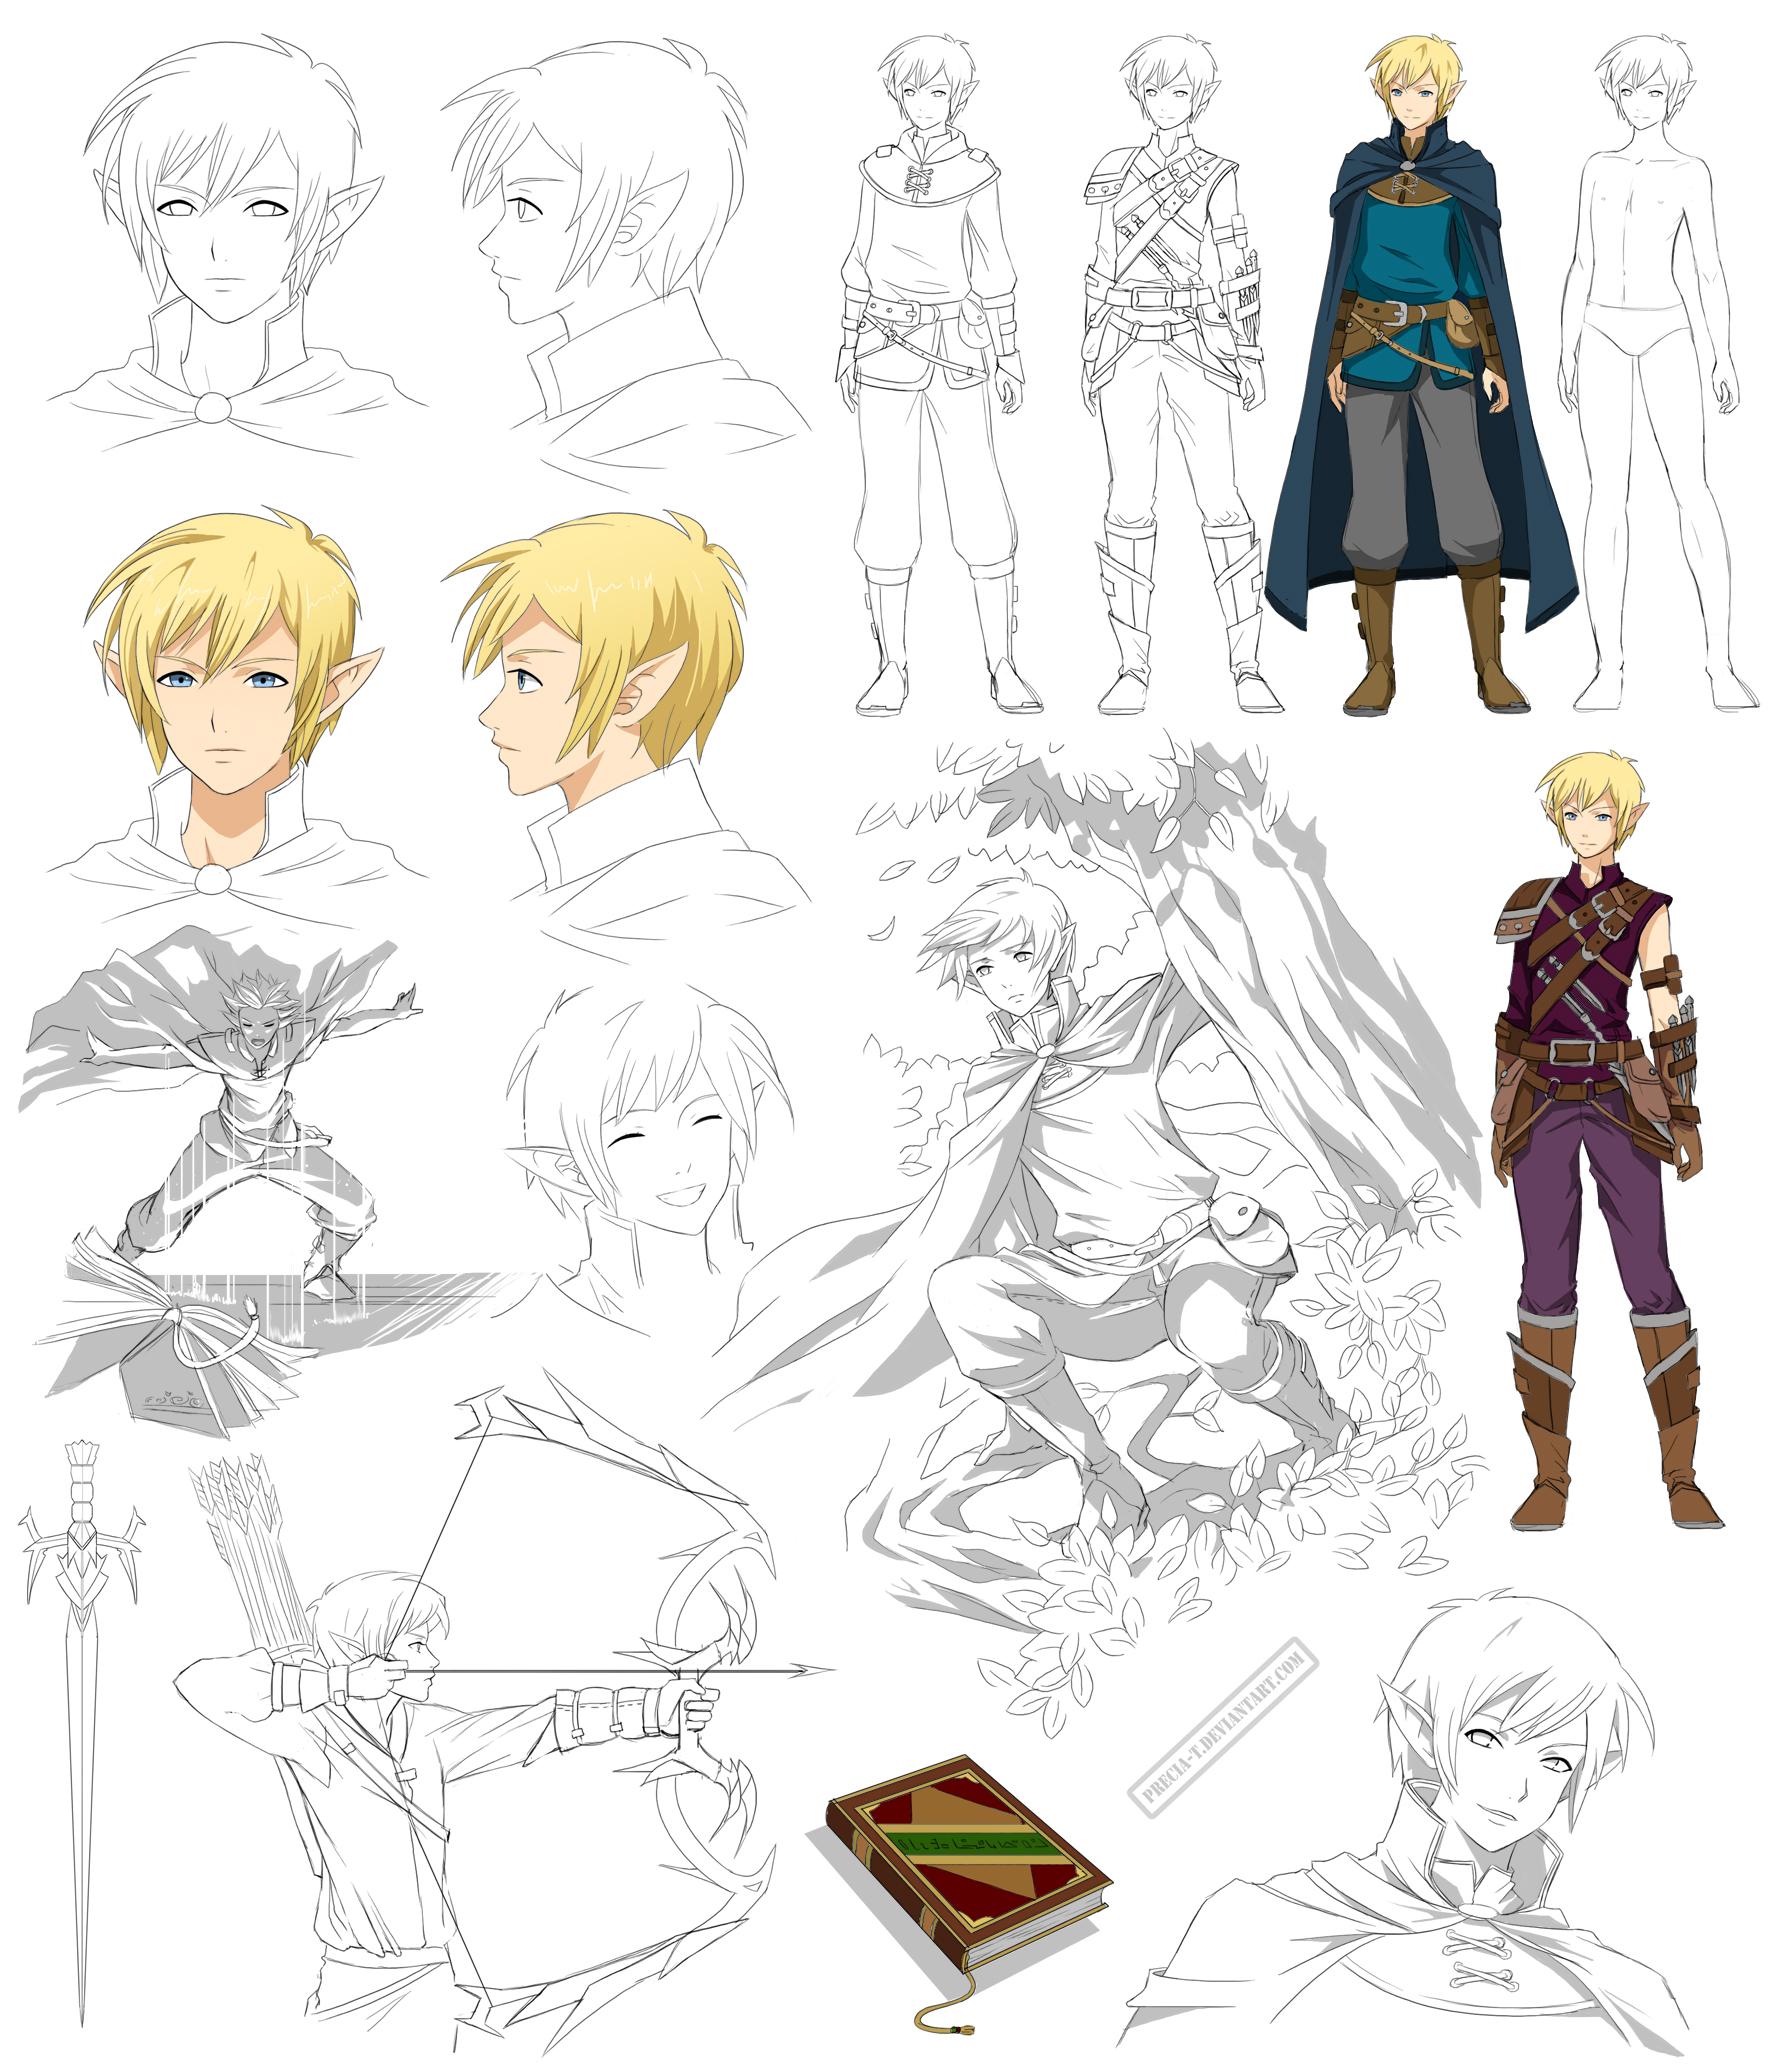 Elf boy design, Icarus (Commision) by Precia-T